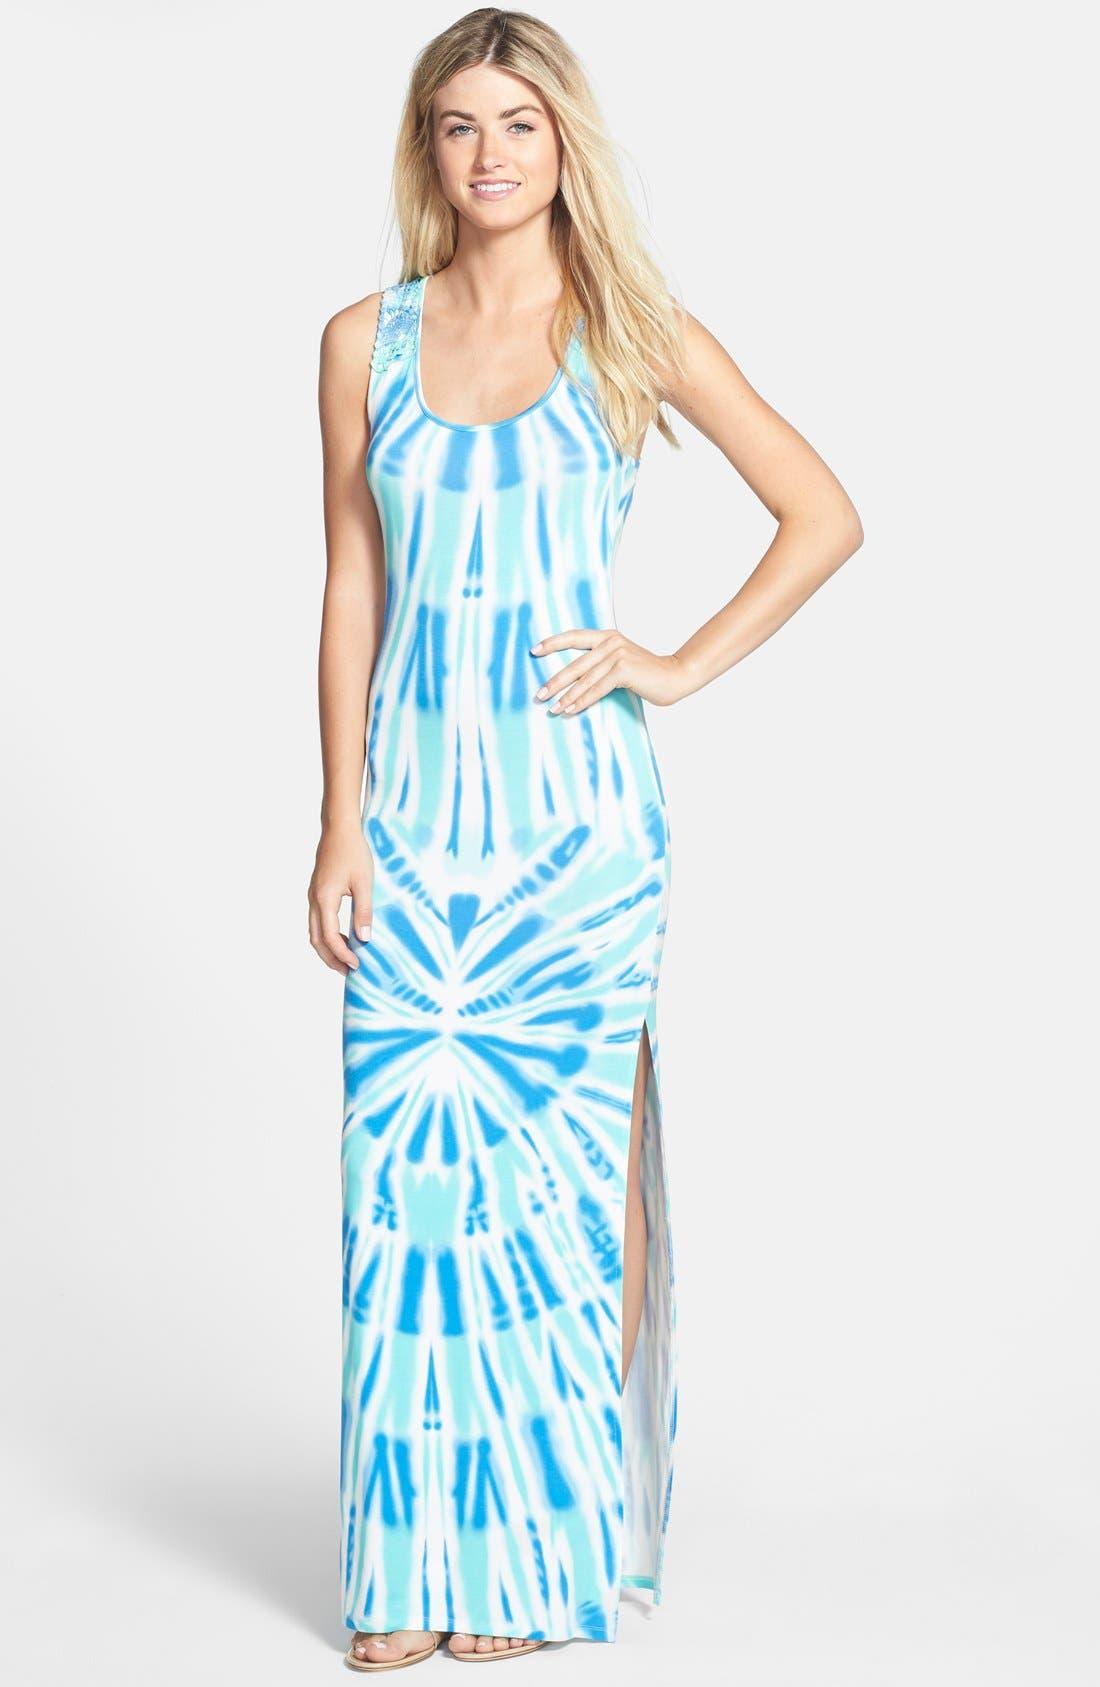 Main Image - Felicity & Coco Crochet Back Tie Dye Maxi Dress (Regular & Petite) (Nordstrom Exclusive)